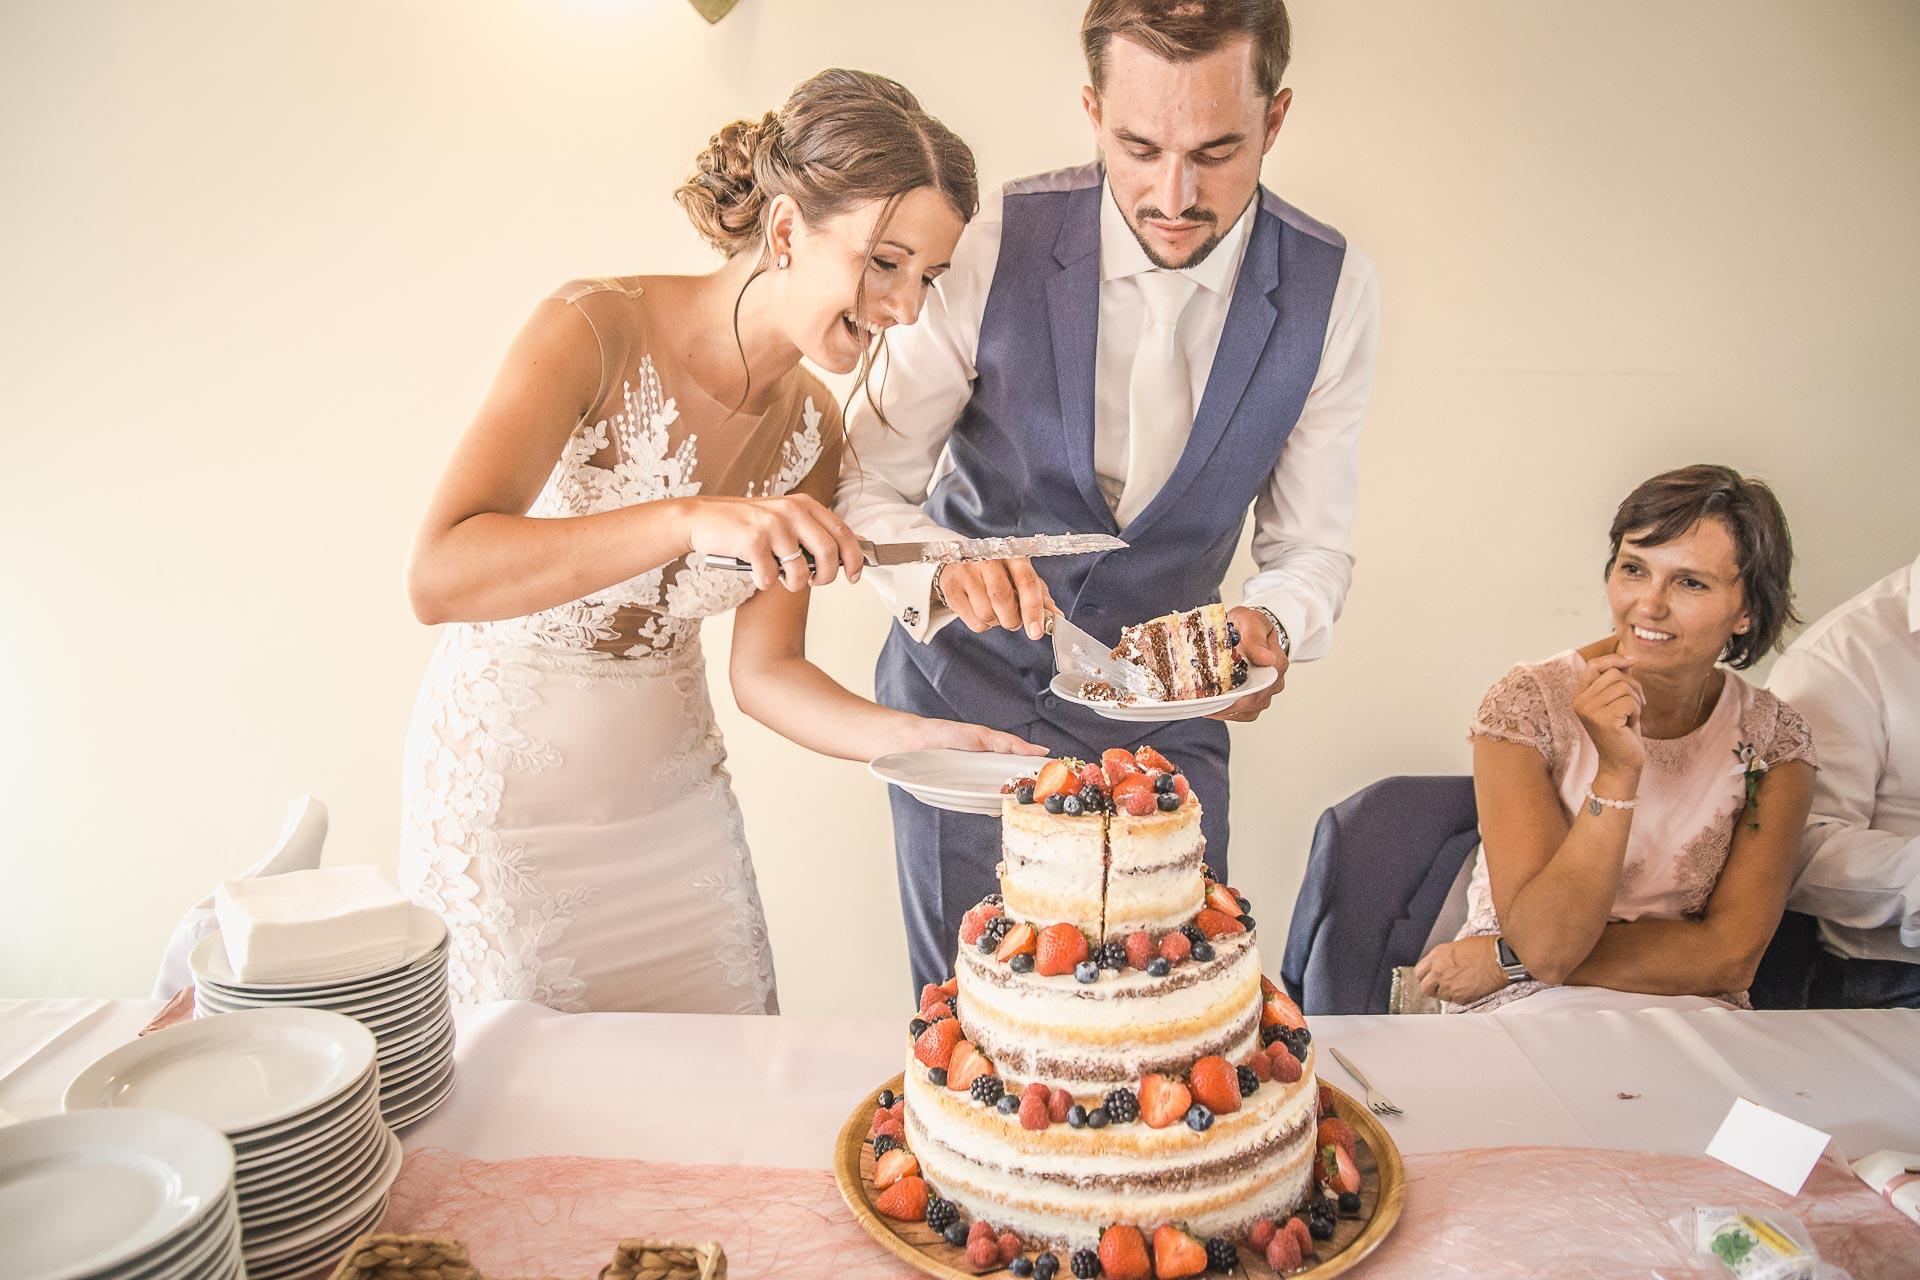 svatební-fotograf-wedding-svatebni-video-orlík-vltava-kostel-statek-stodola-boho-svatba-Beautyfoto-466